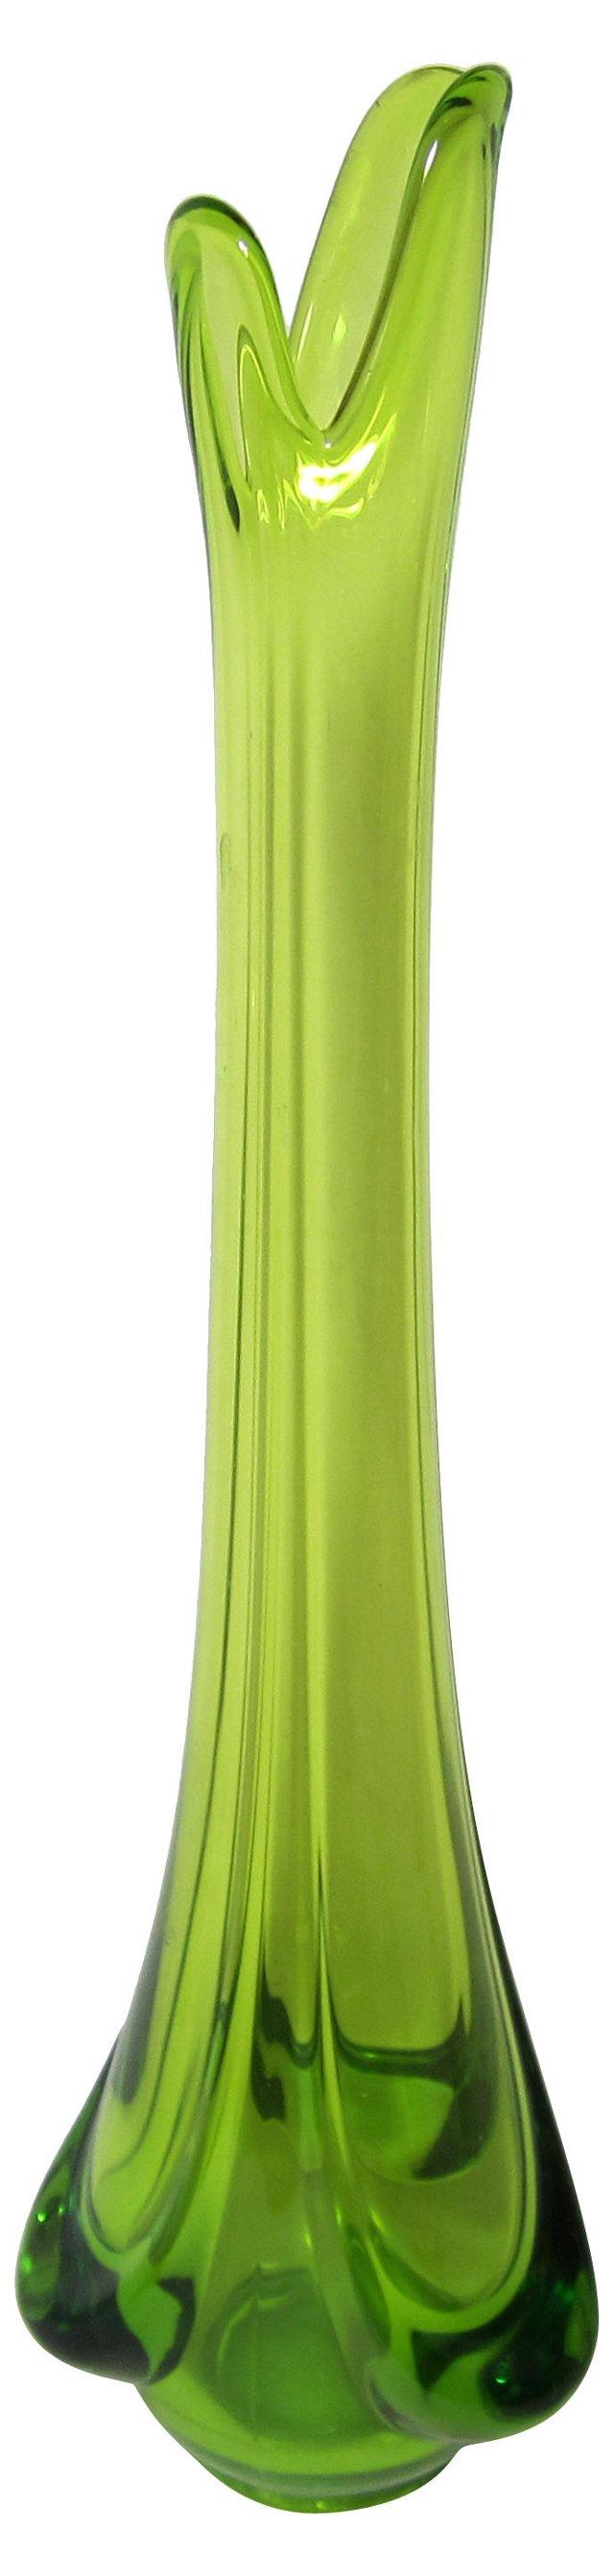 Midcentury Chartreuse Vase